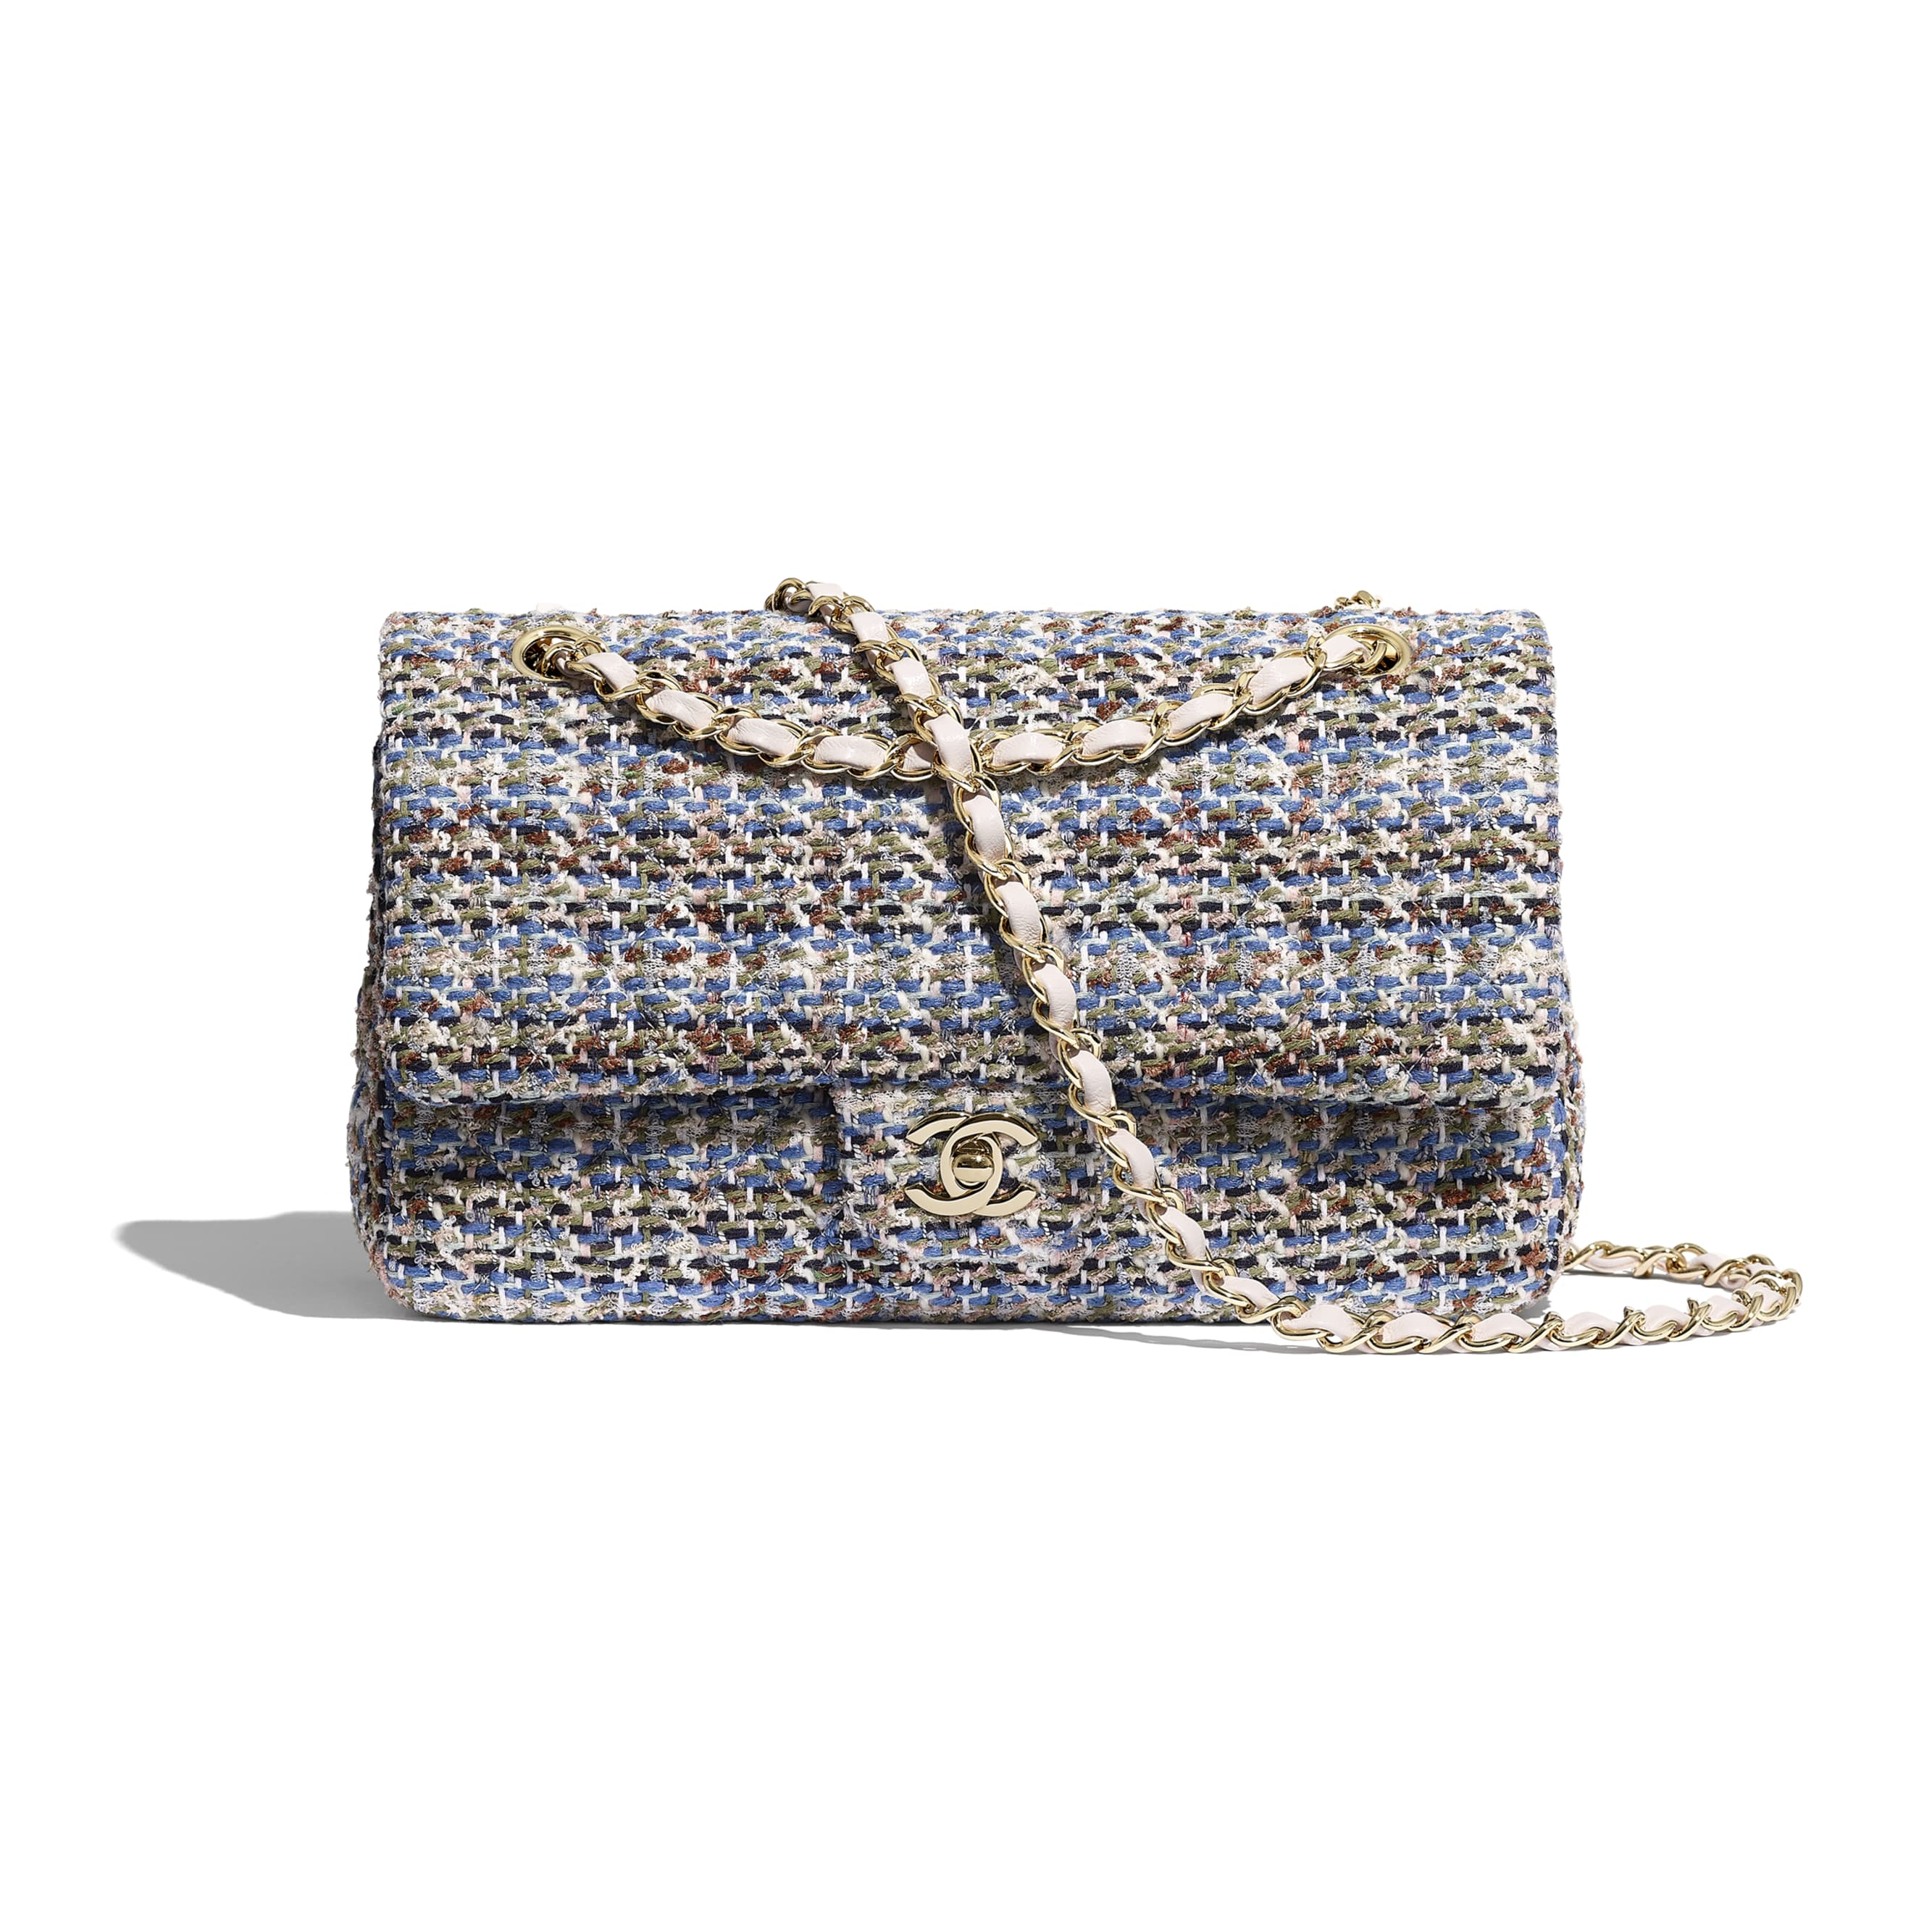 Classic Handbag - Blue, Khaki, White & Navy Blue - Tweed & Gold-Tone Metal - CHANEL - Default view - see standard sized version